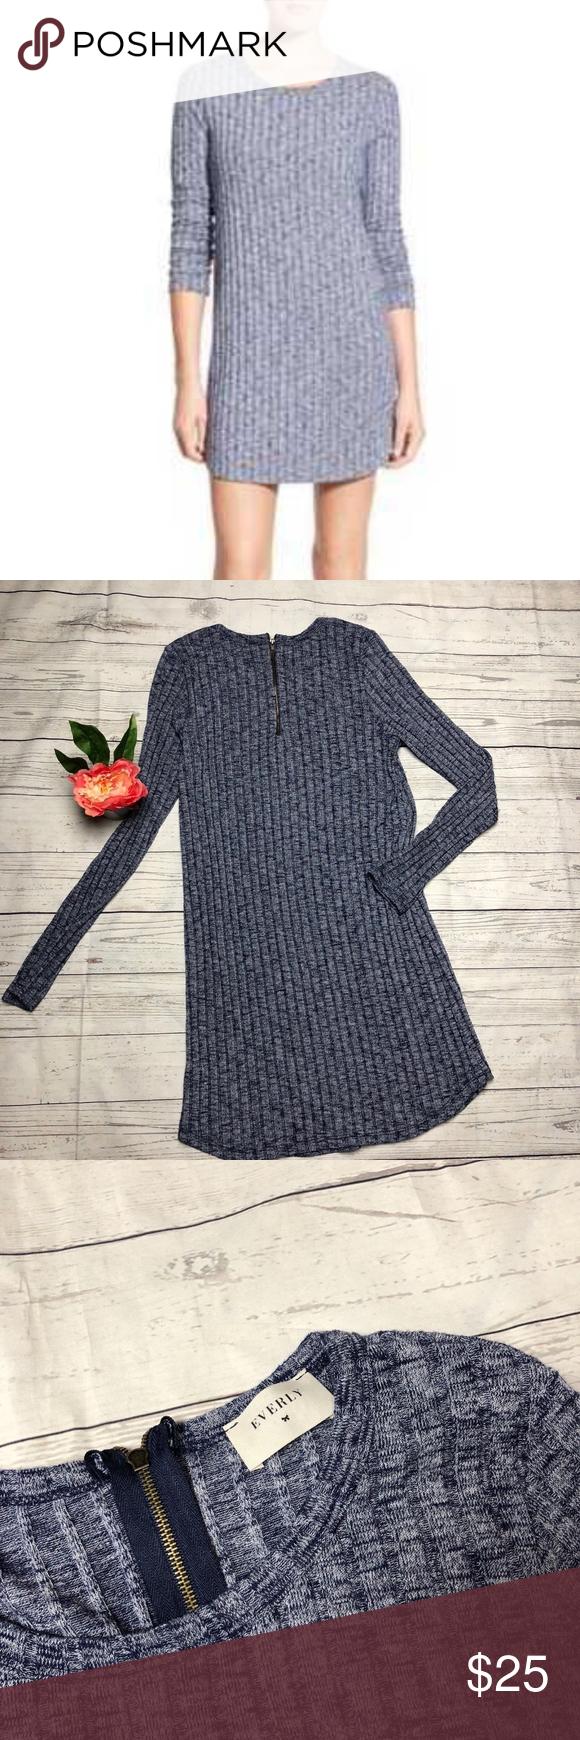 sale everly blue u white knit ribbed dress everly dresses zip